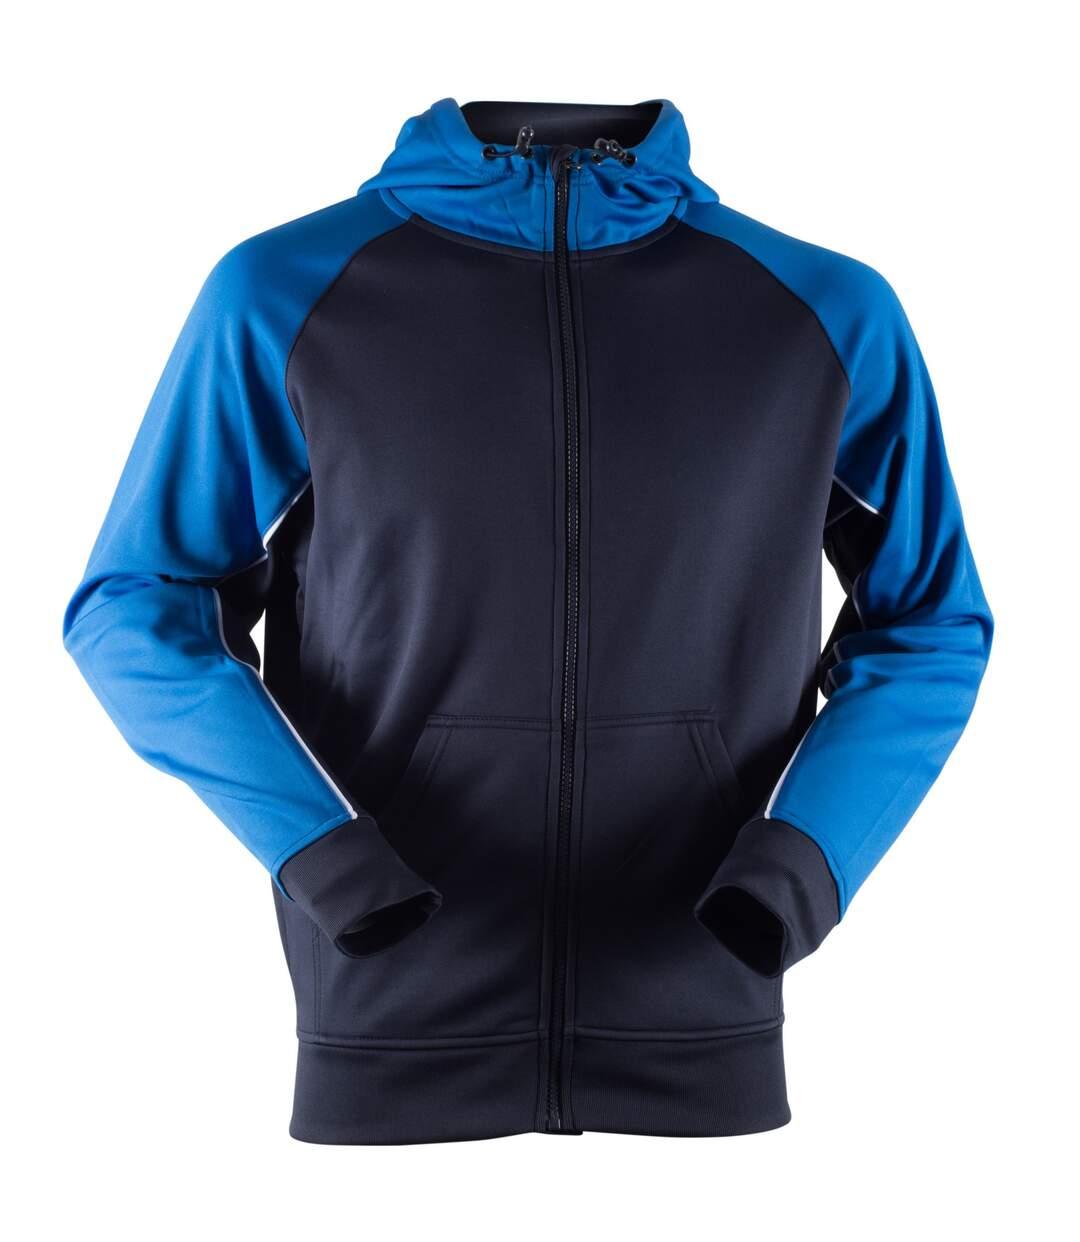 Finden & Hales Mens Moisture Wicking Panelled Sports Hoodie (Navy/Royal/White) - UTRW4690